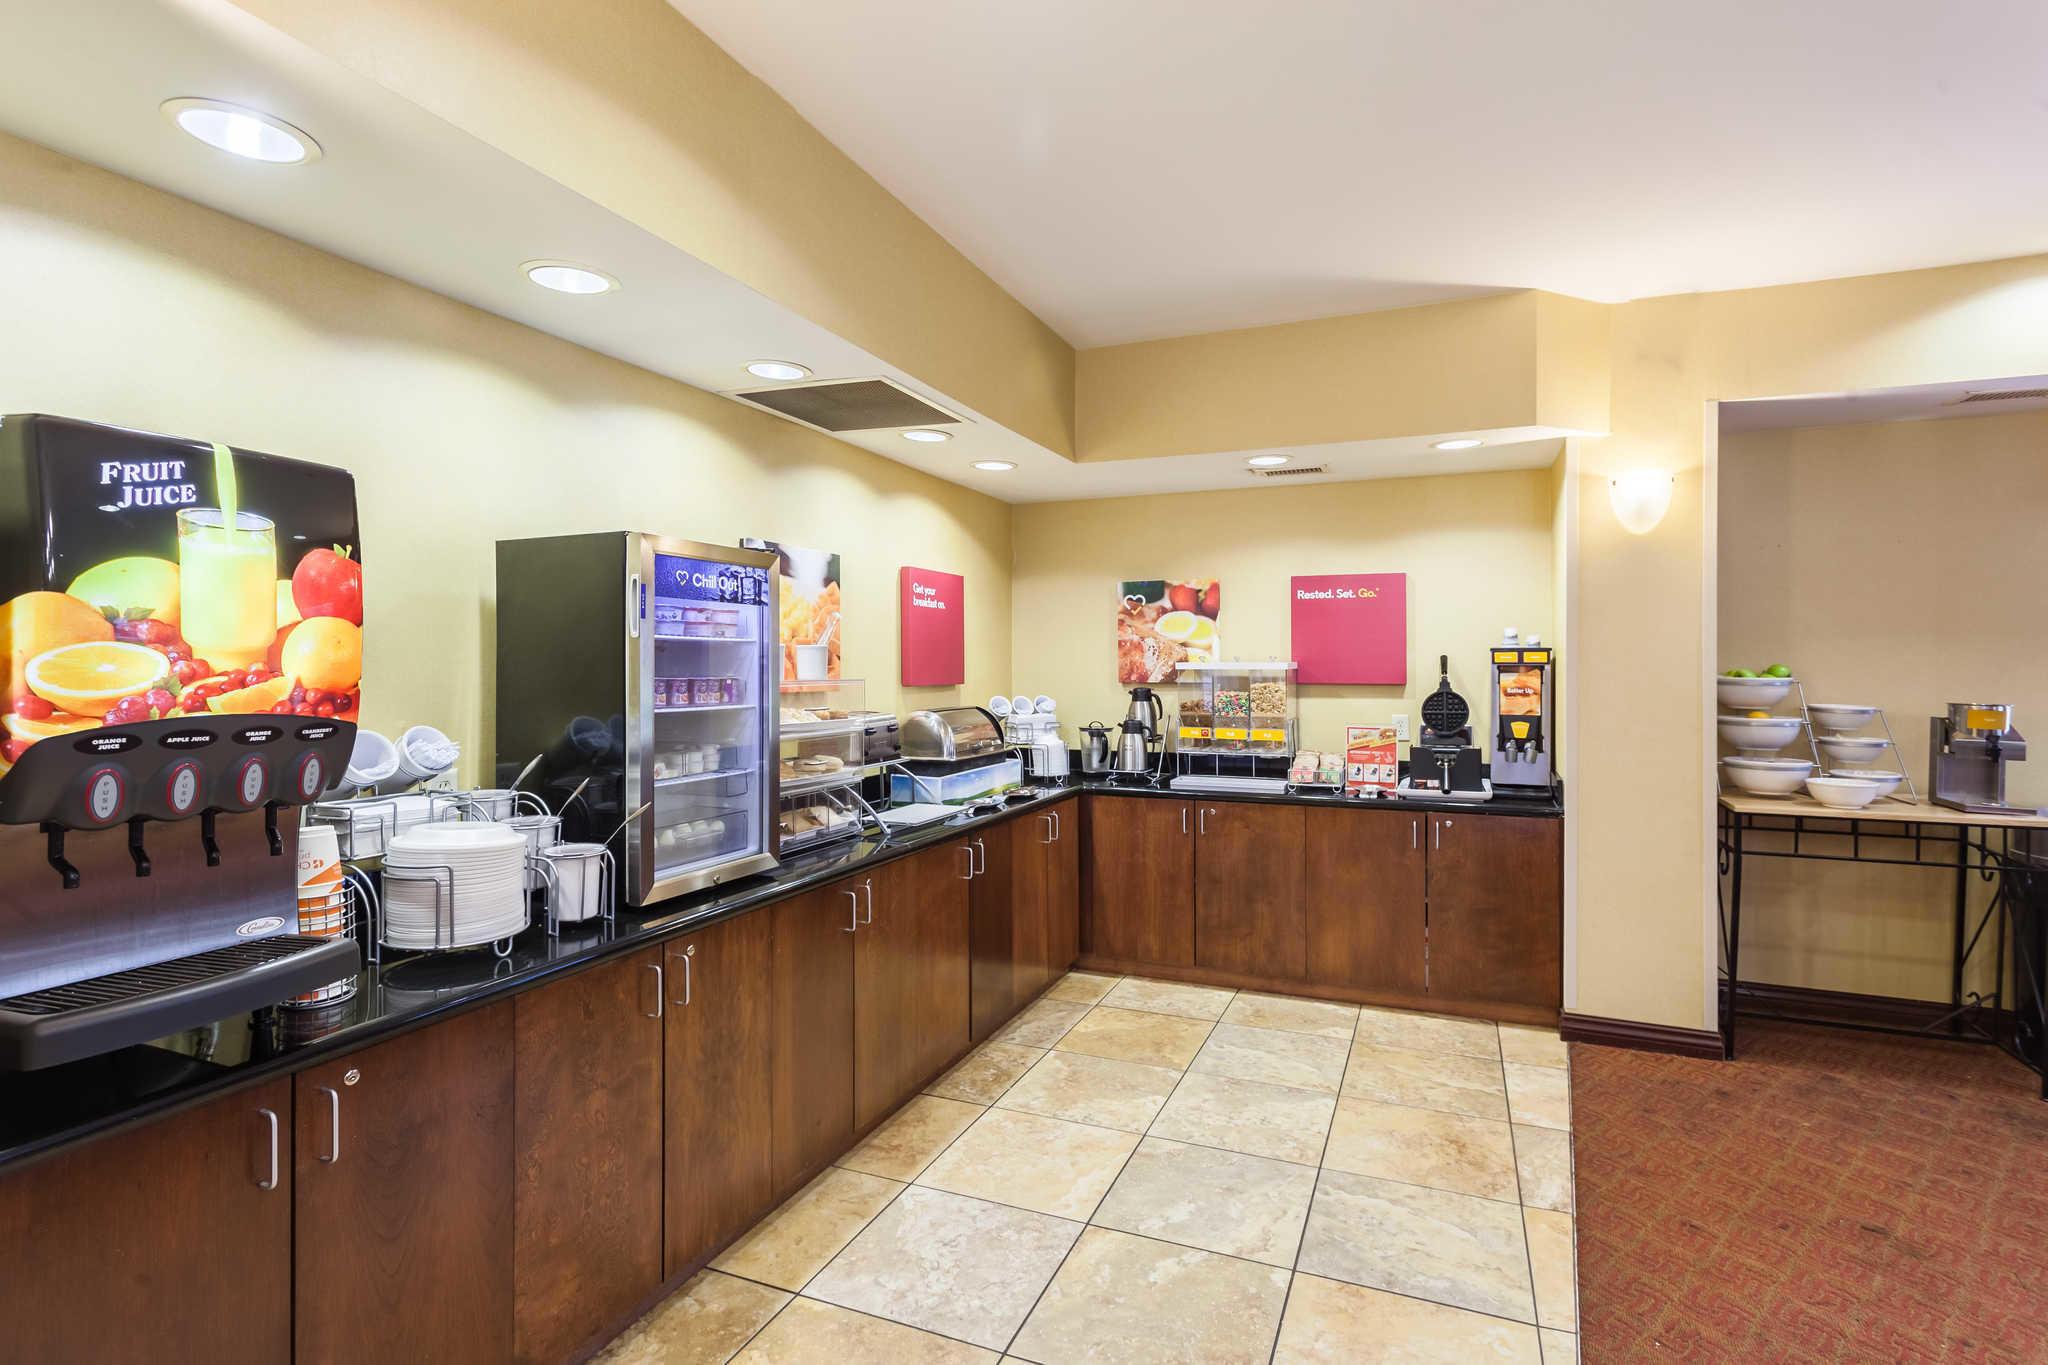 Home depot lincoln ne 28 images home depot kitchen for Kitchen remodeling lincoln ne